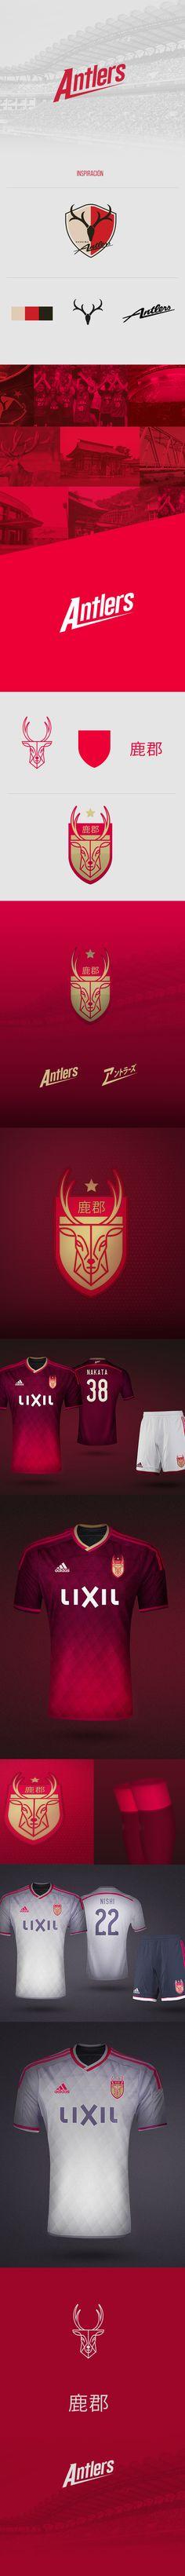 J-League · Kashima Antlers on Behance